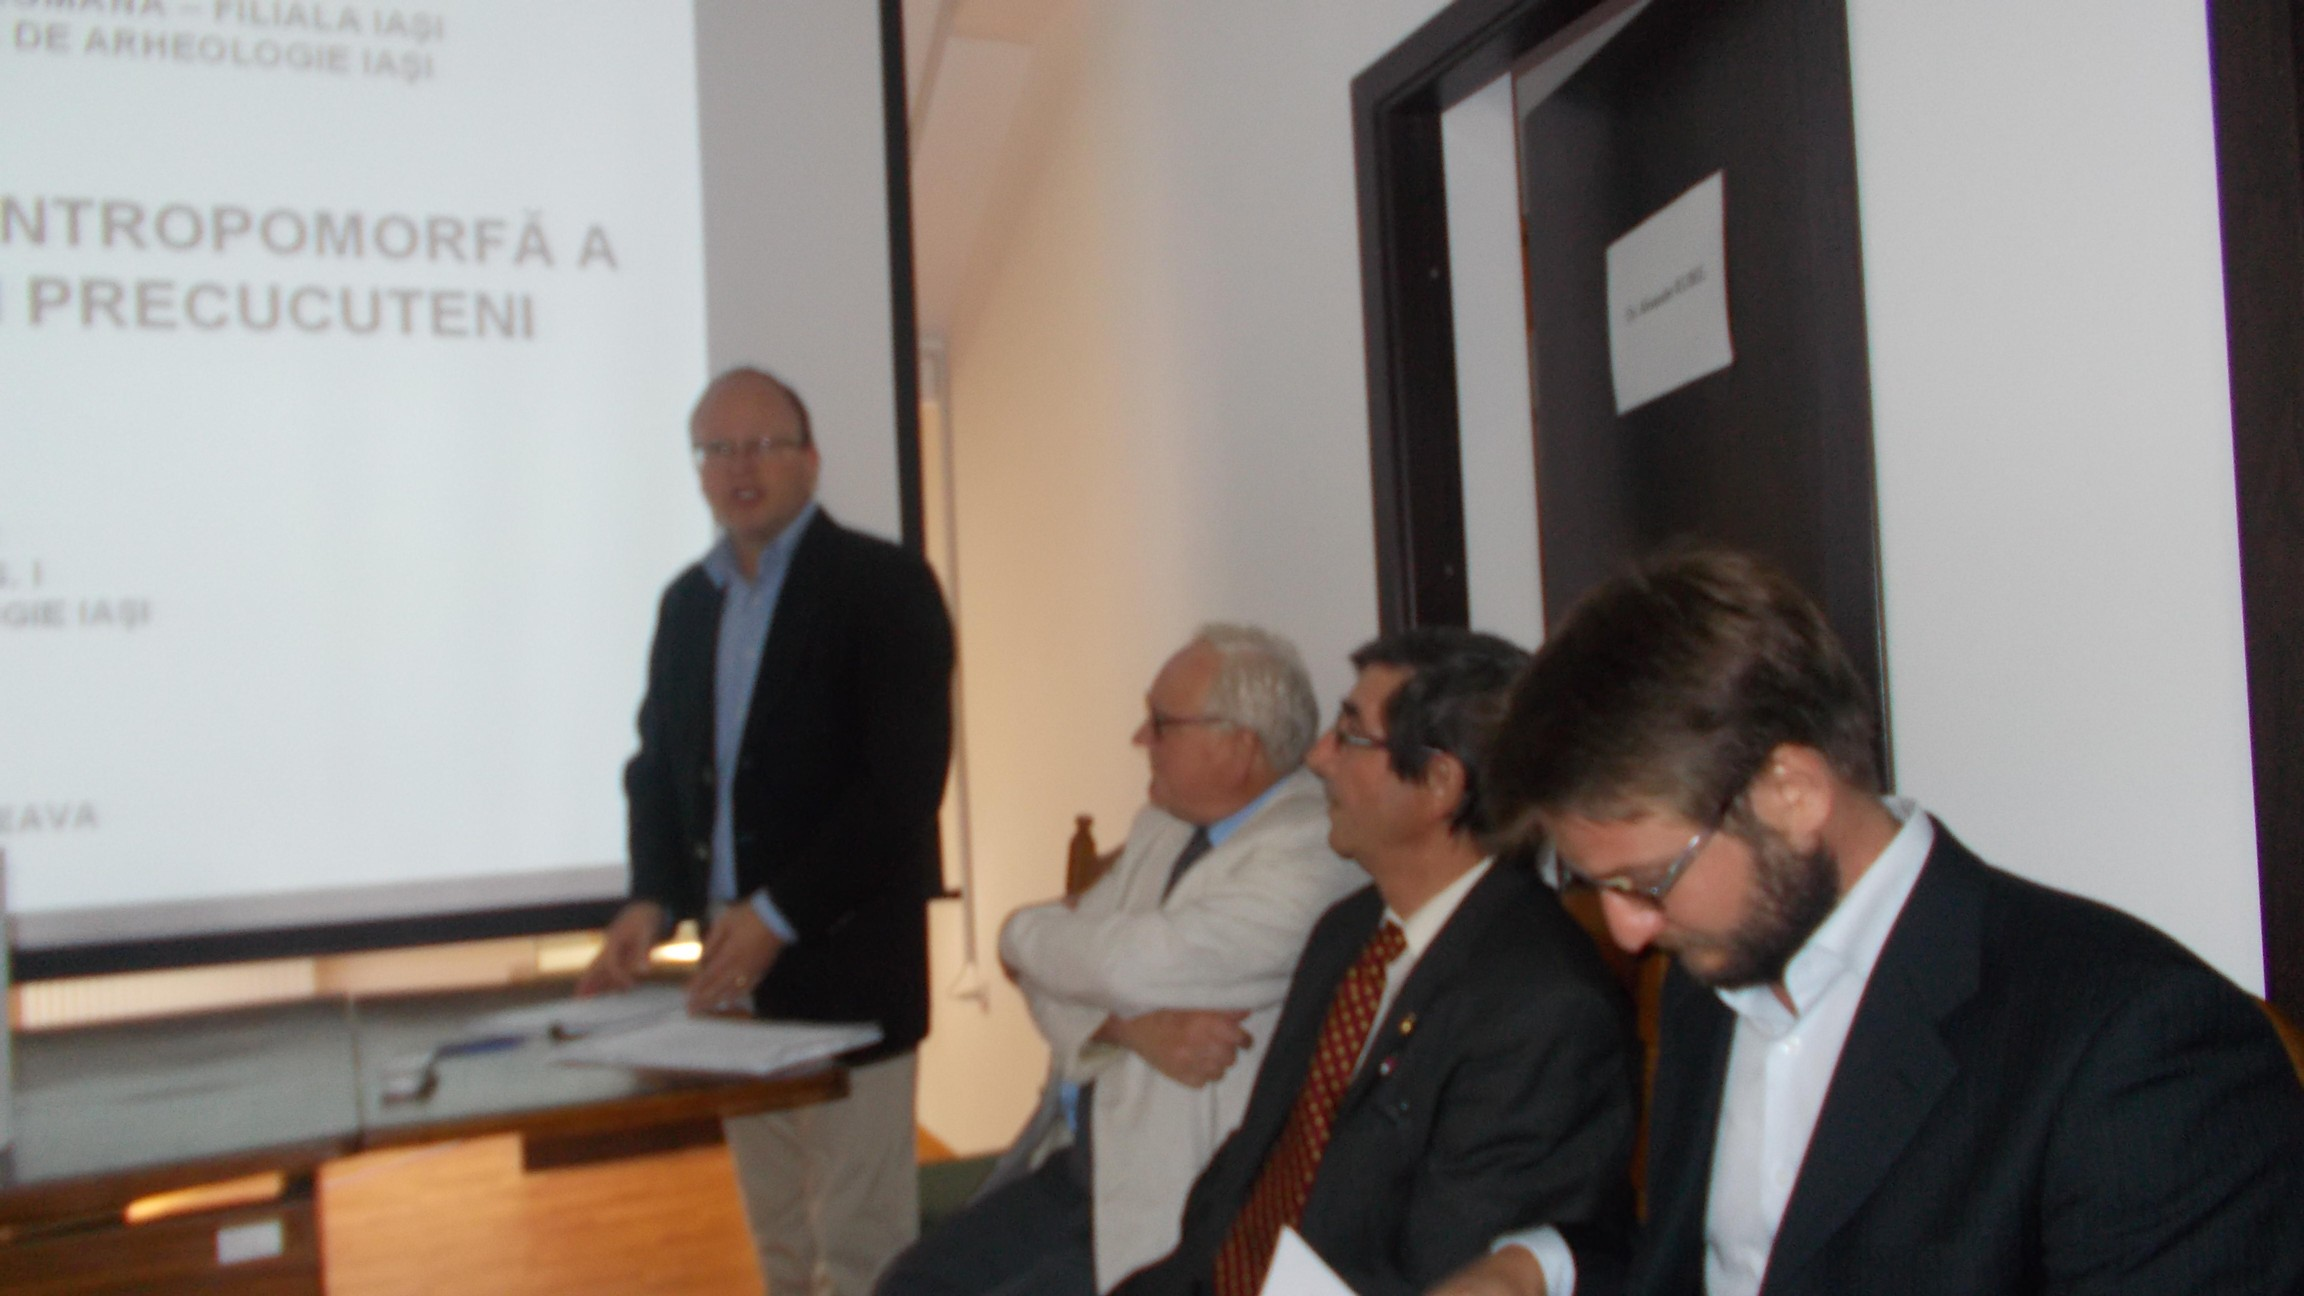 Universitarii Alexander Rudel, Nicolae Ursulescu, Vasile Chirica şi George Bodi.